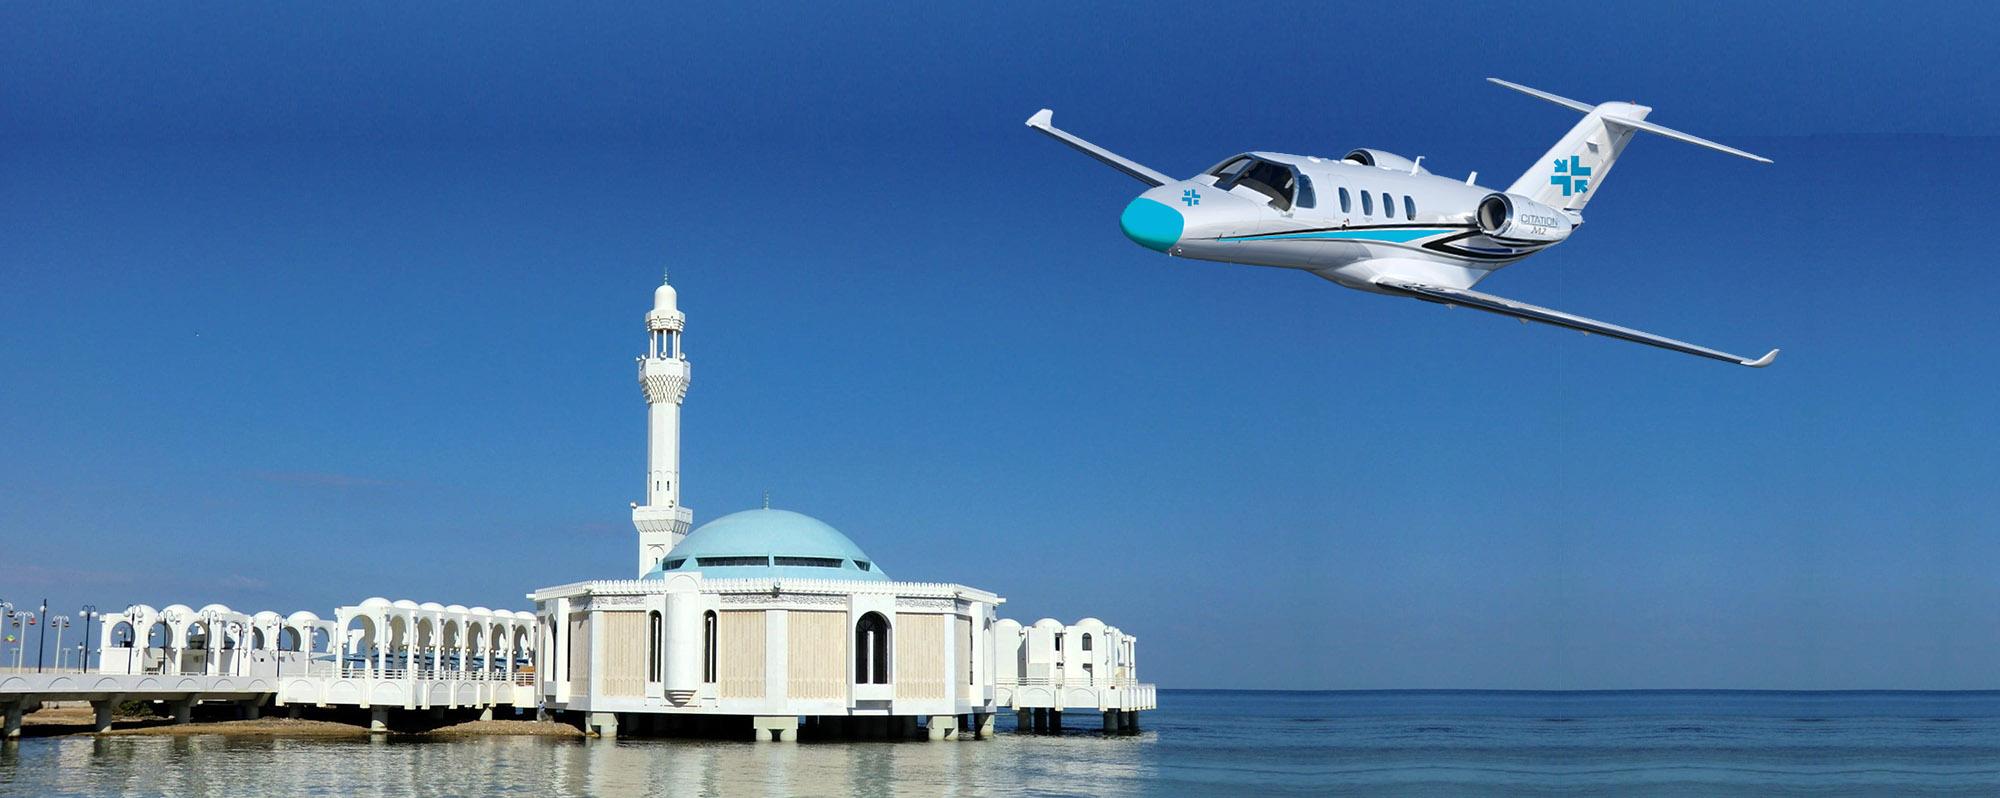 Air Ambulance jeddah, riyad, dammam, Saudi Arabia